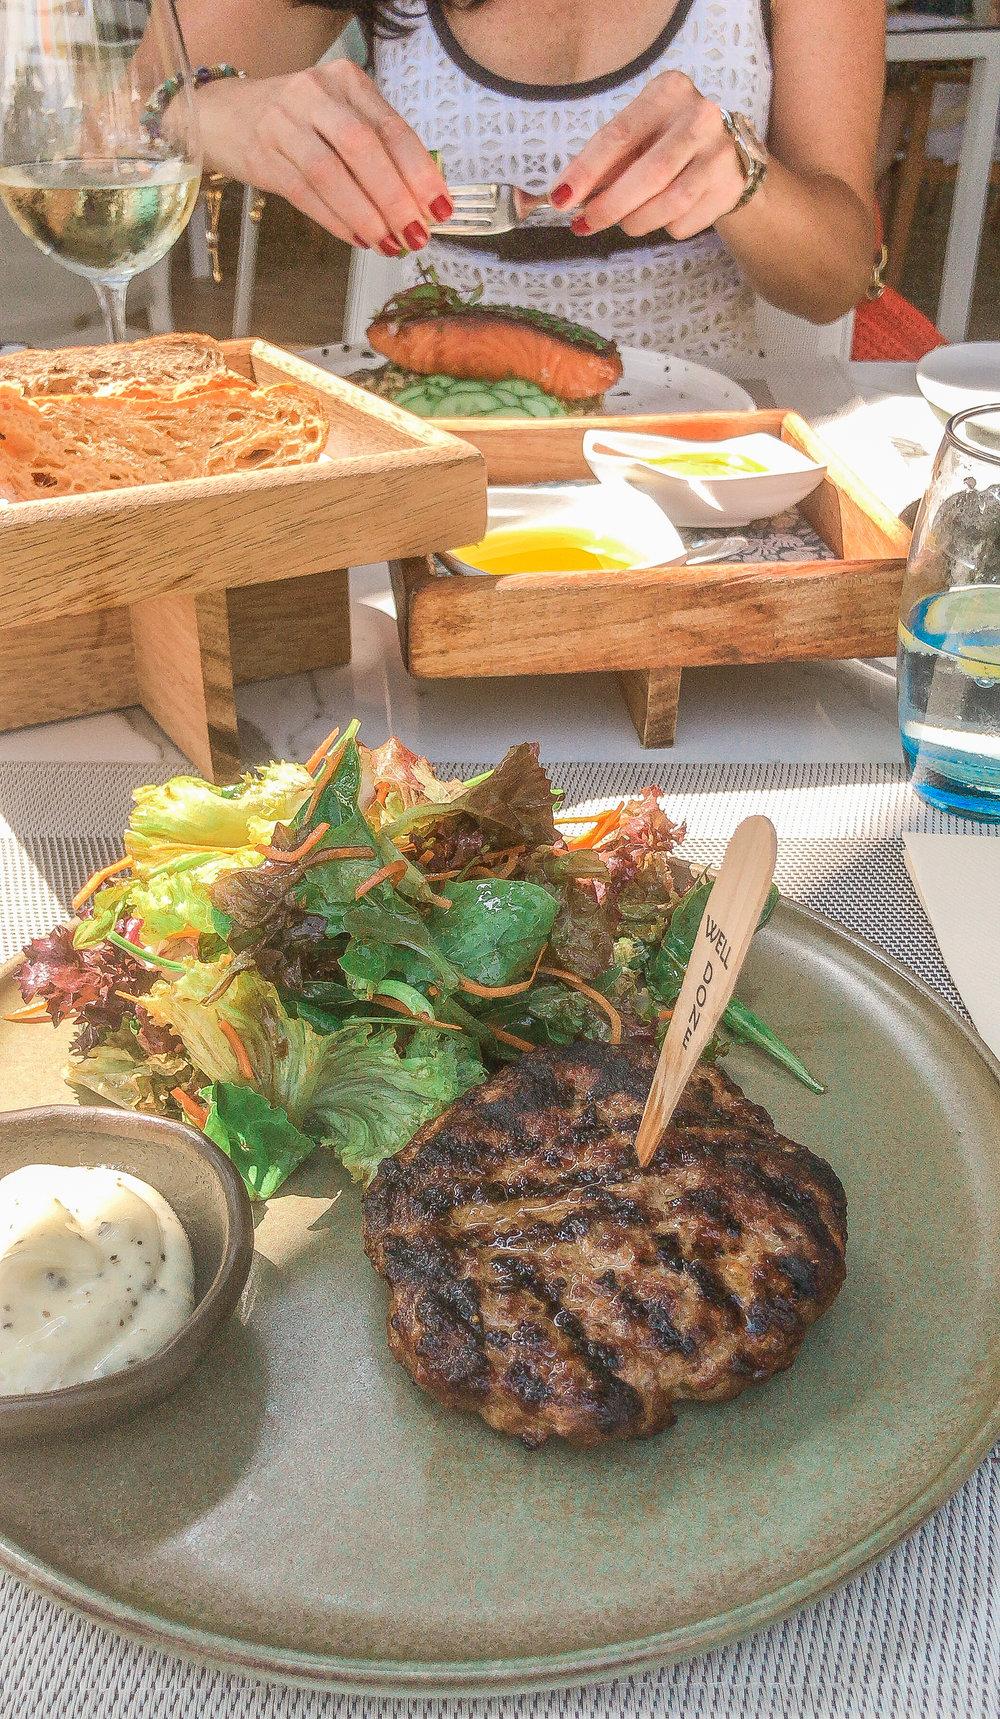 Lunch at Colombia Limassol Cyprus www.lindahaggh.com.jpg